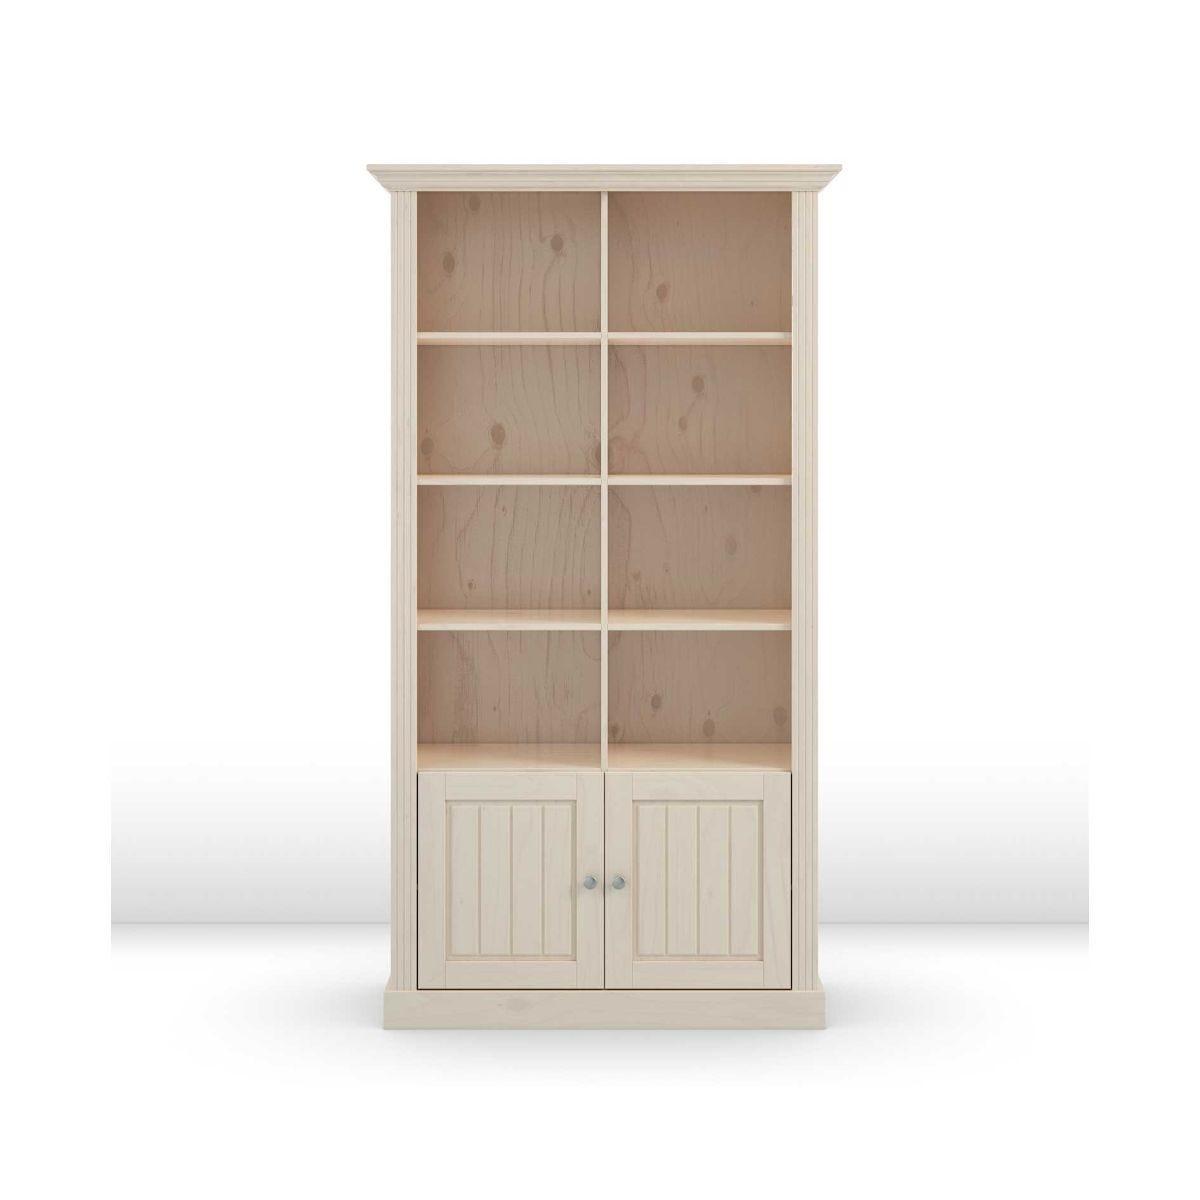 Steens Monaco 6 Shelf Bookcase with Doors, Whitewash